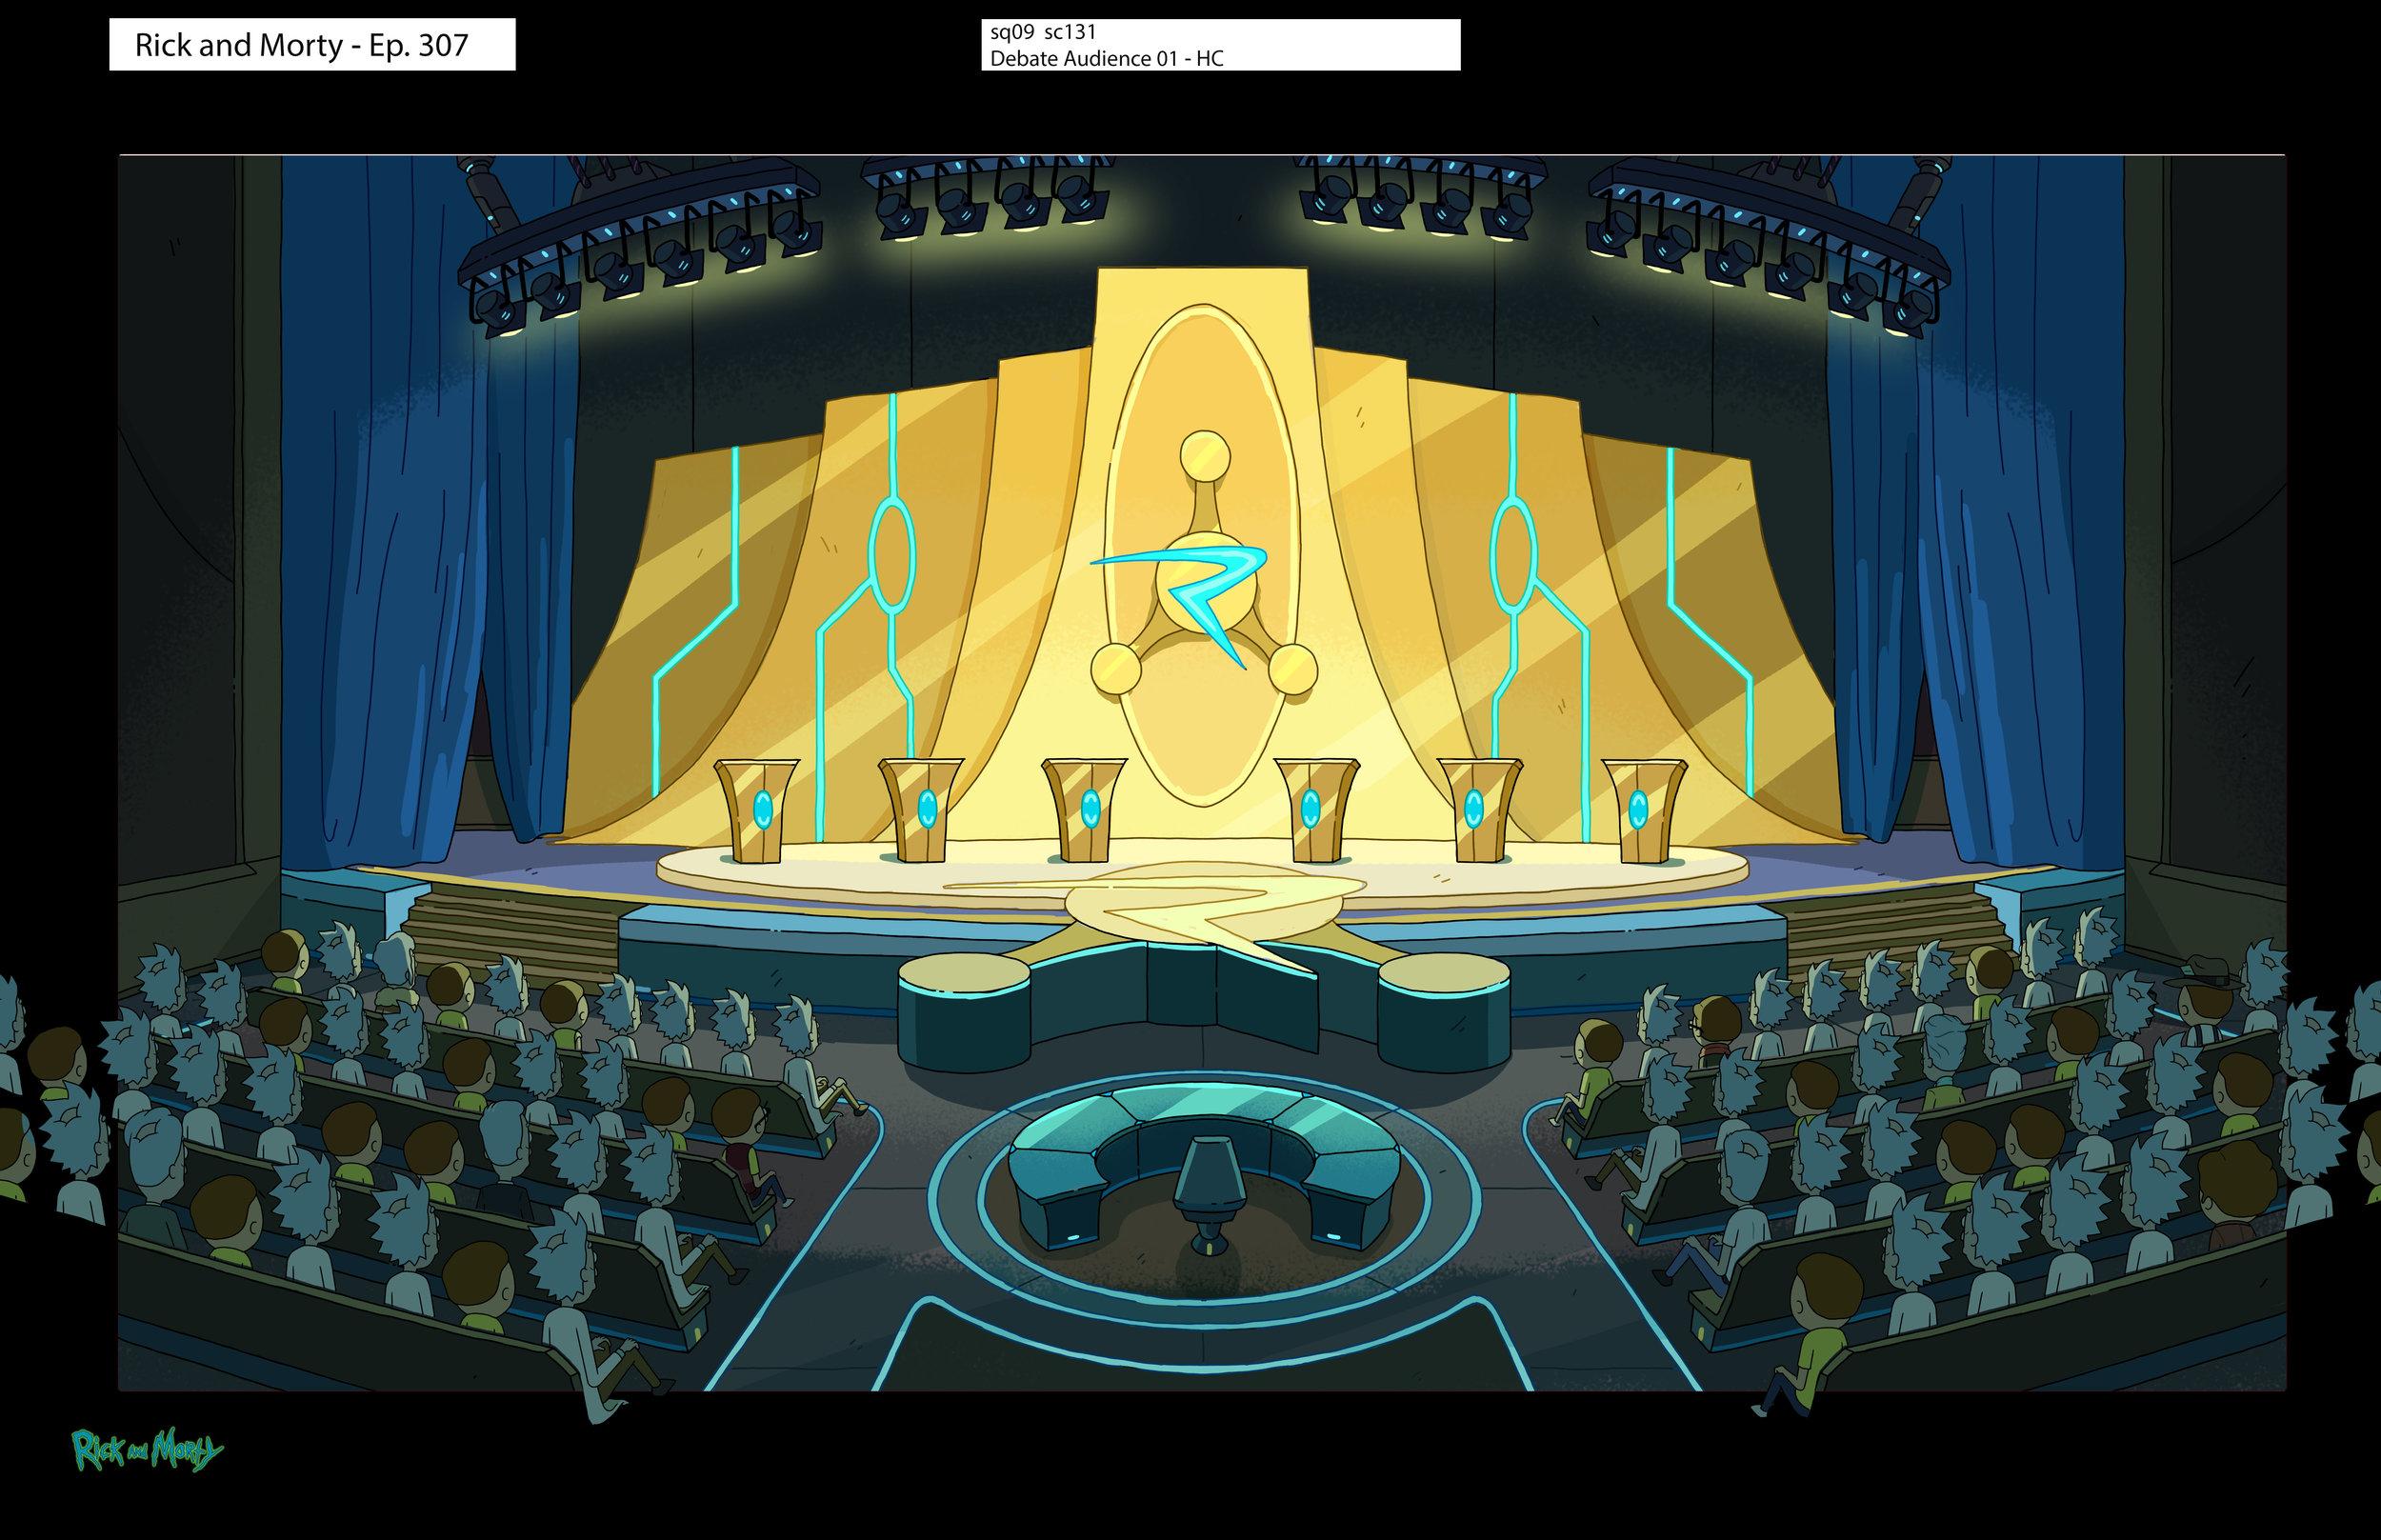 307_CH_sq09sc131_DebateAudience01_HC_Color_V1_CB.jpg